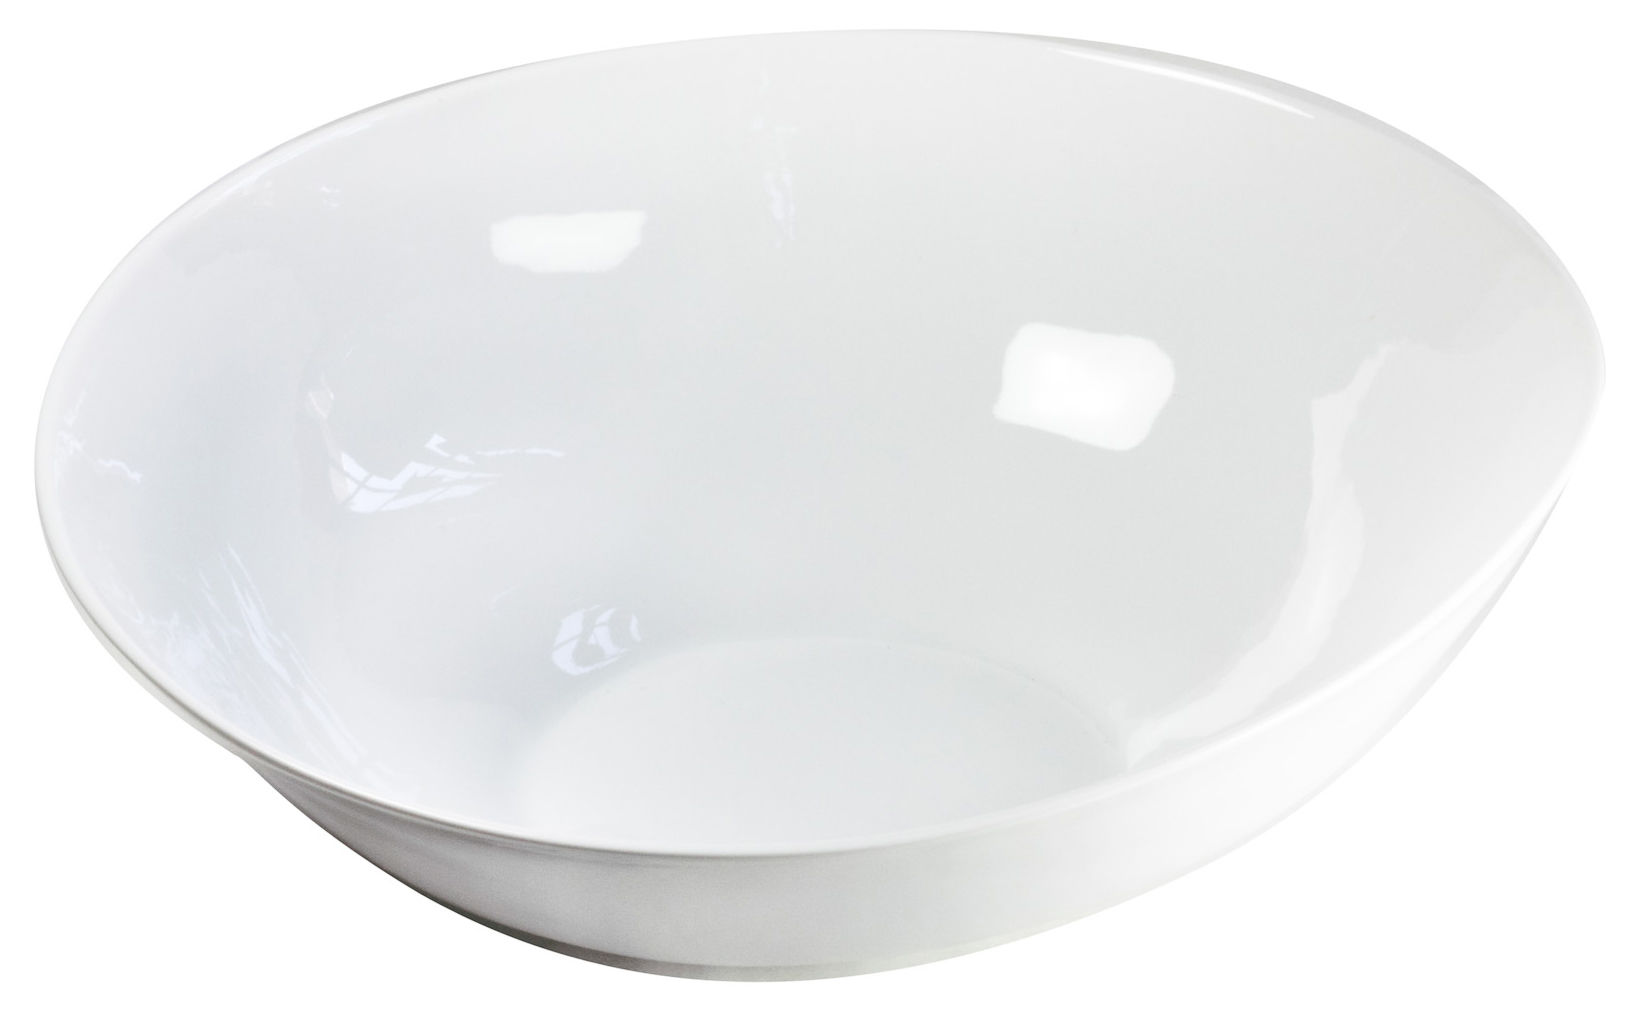 Tableware - Bowls - Affamé Salad bowl by Tsé-Tsé - White - China